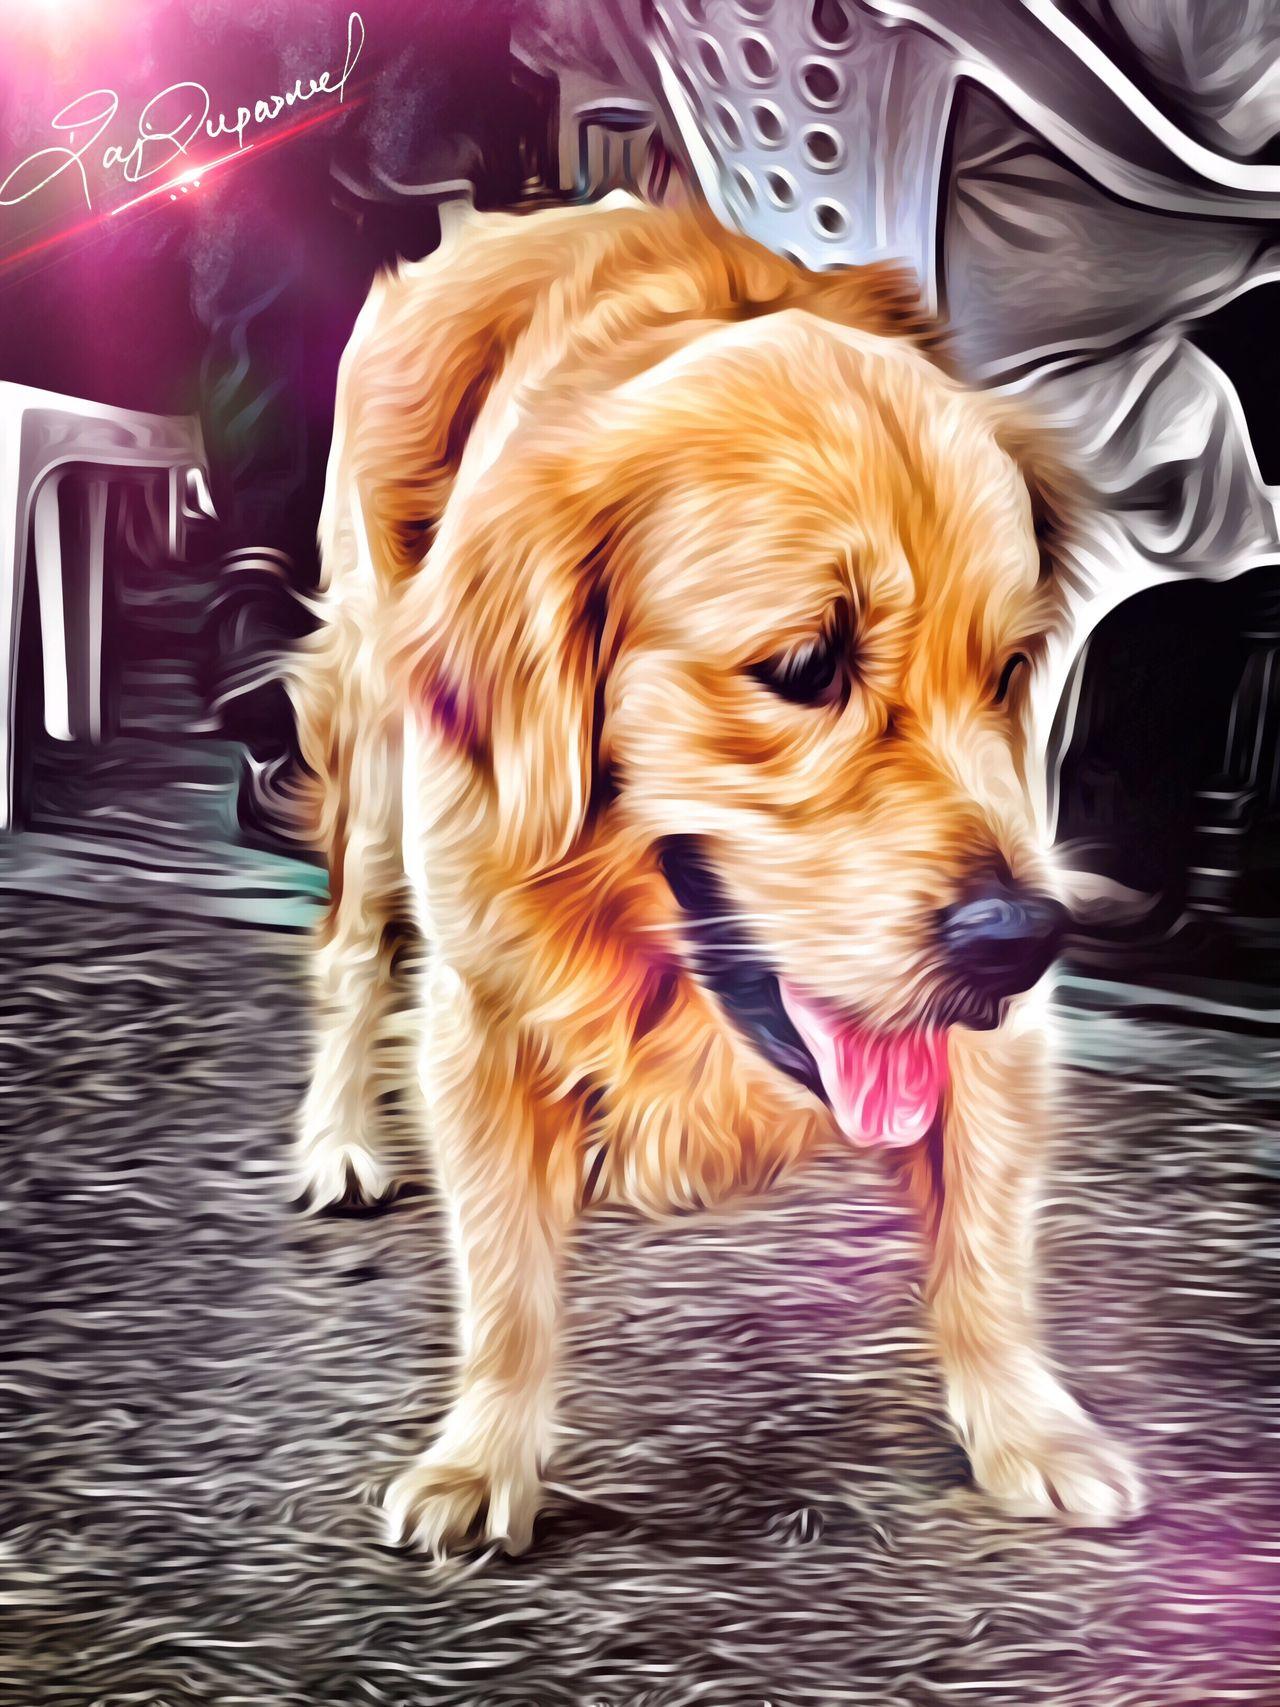 Pets Pet Photography  Worldofbeauty Love Photography Myalbum Myedits MyClick Passion